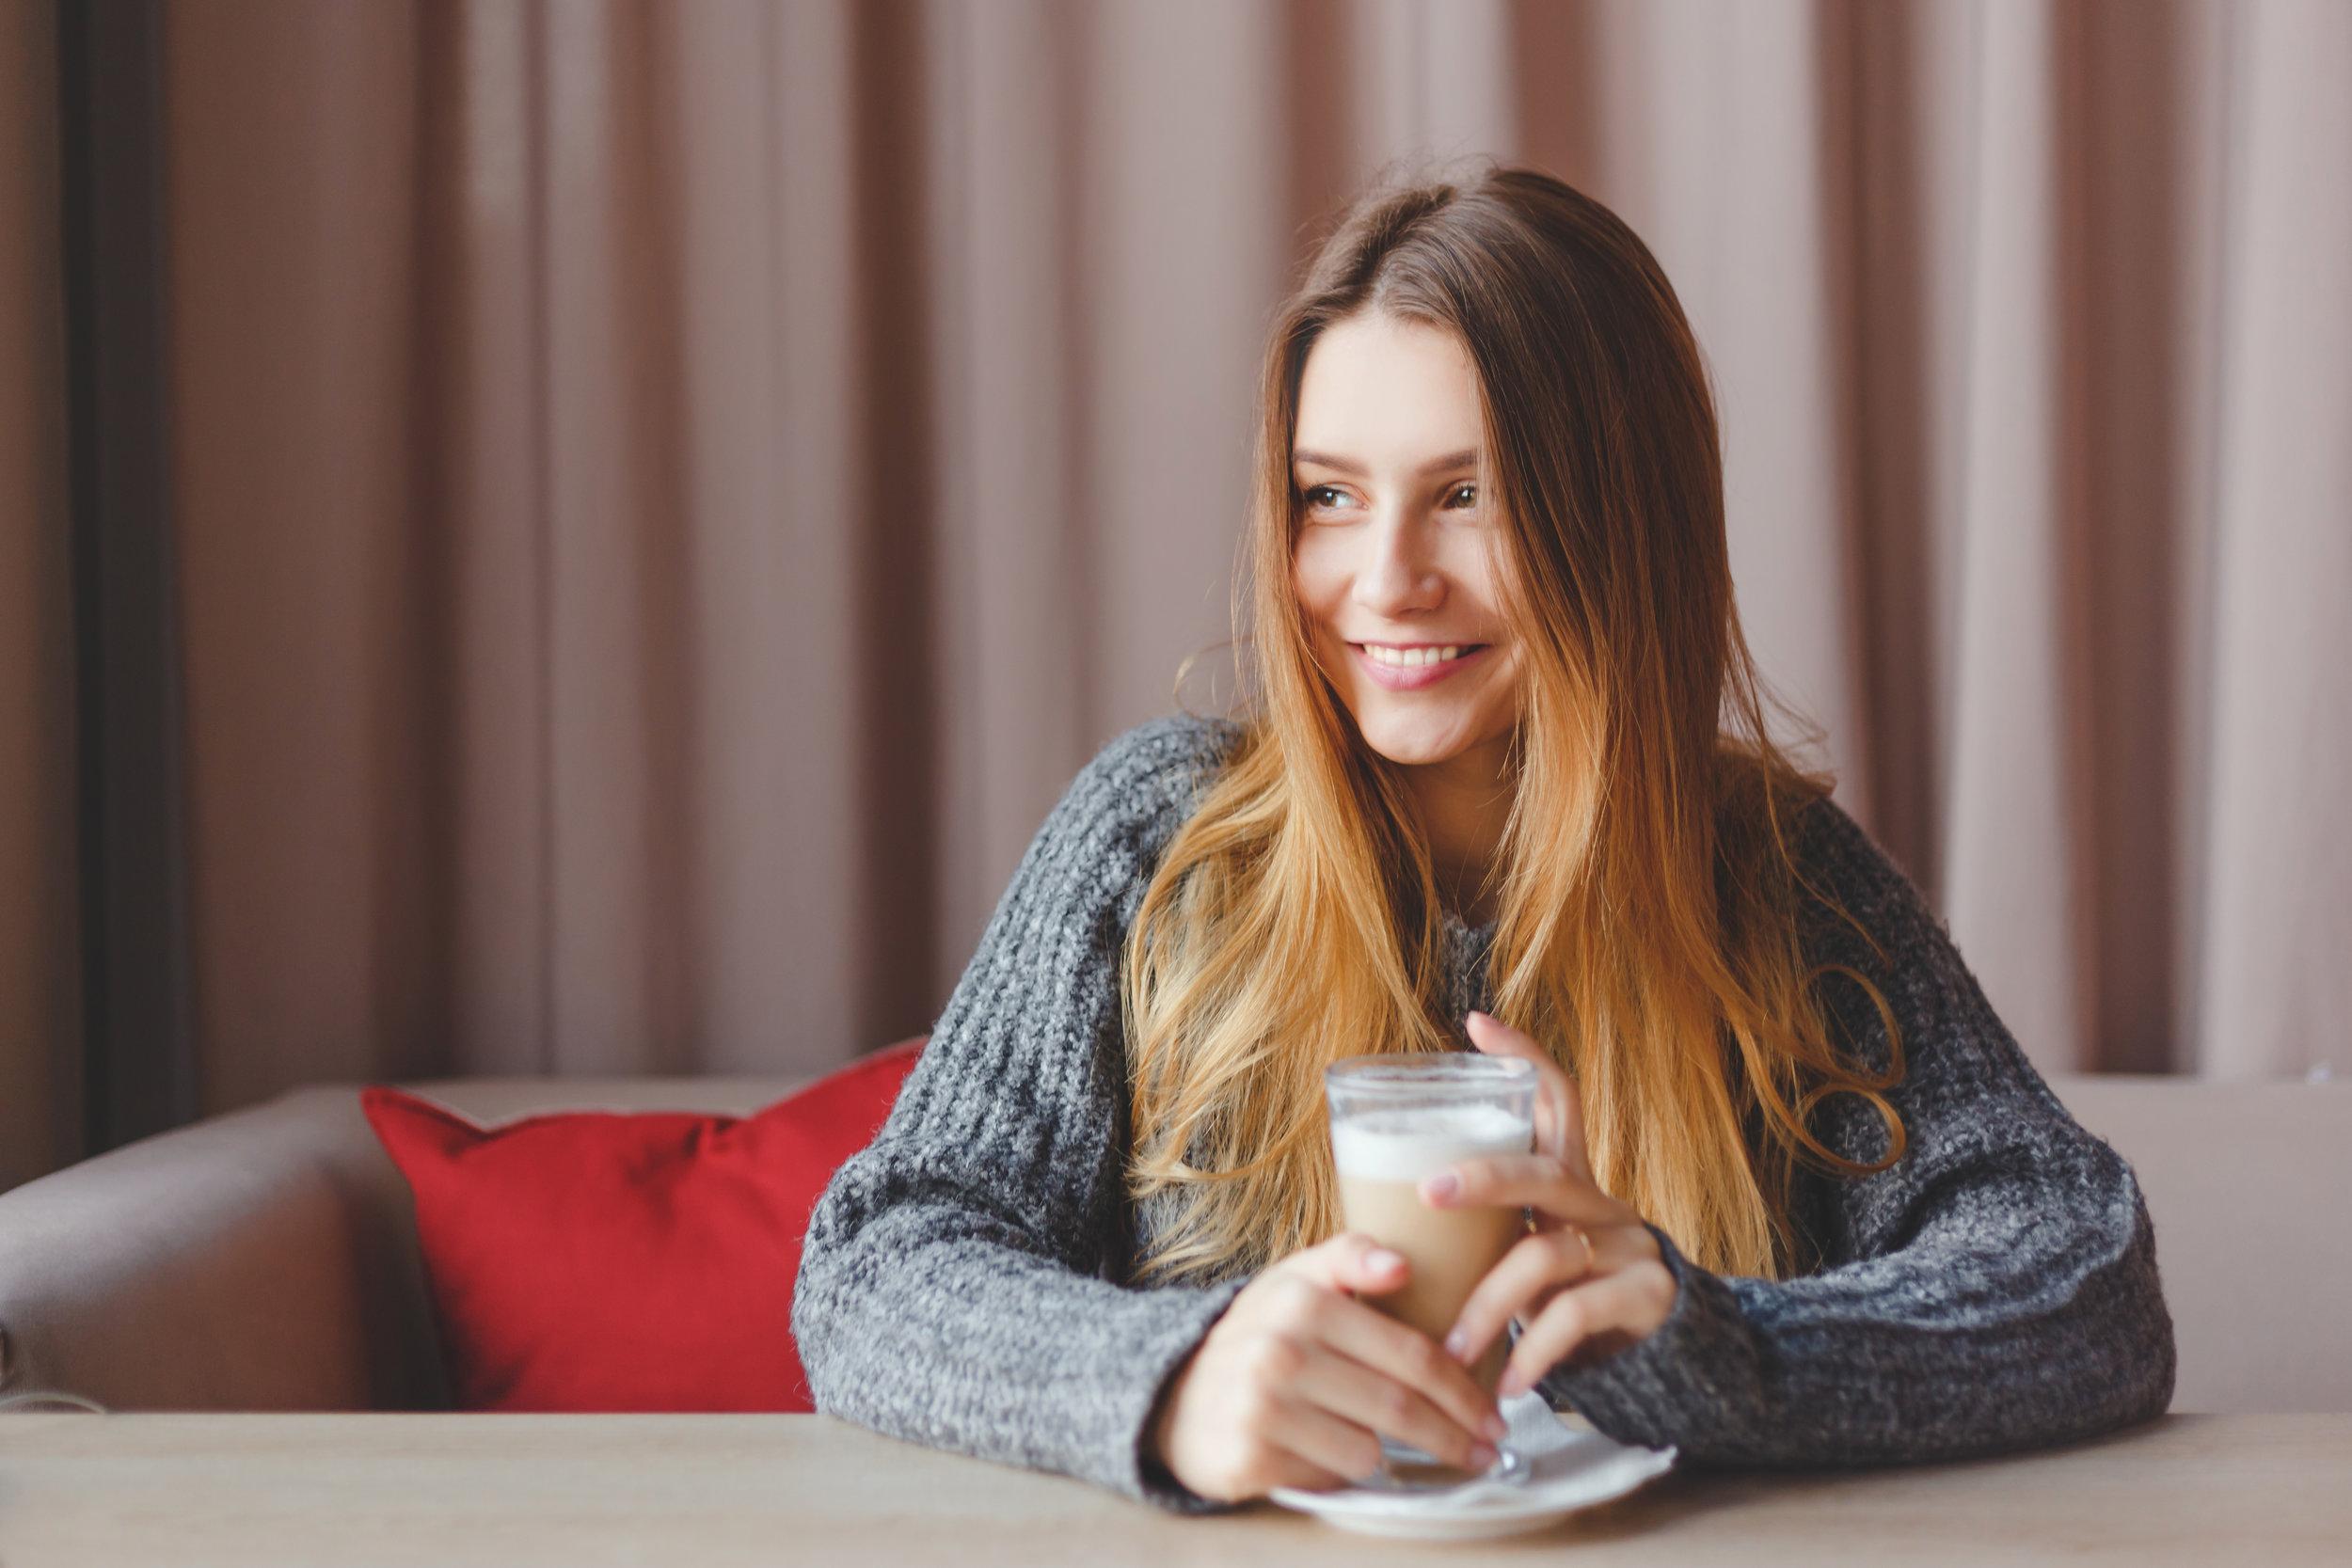 romantic-winter-girl-in-knitted-sweater-dreams-PJ5SWQL.jpg